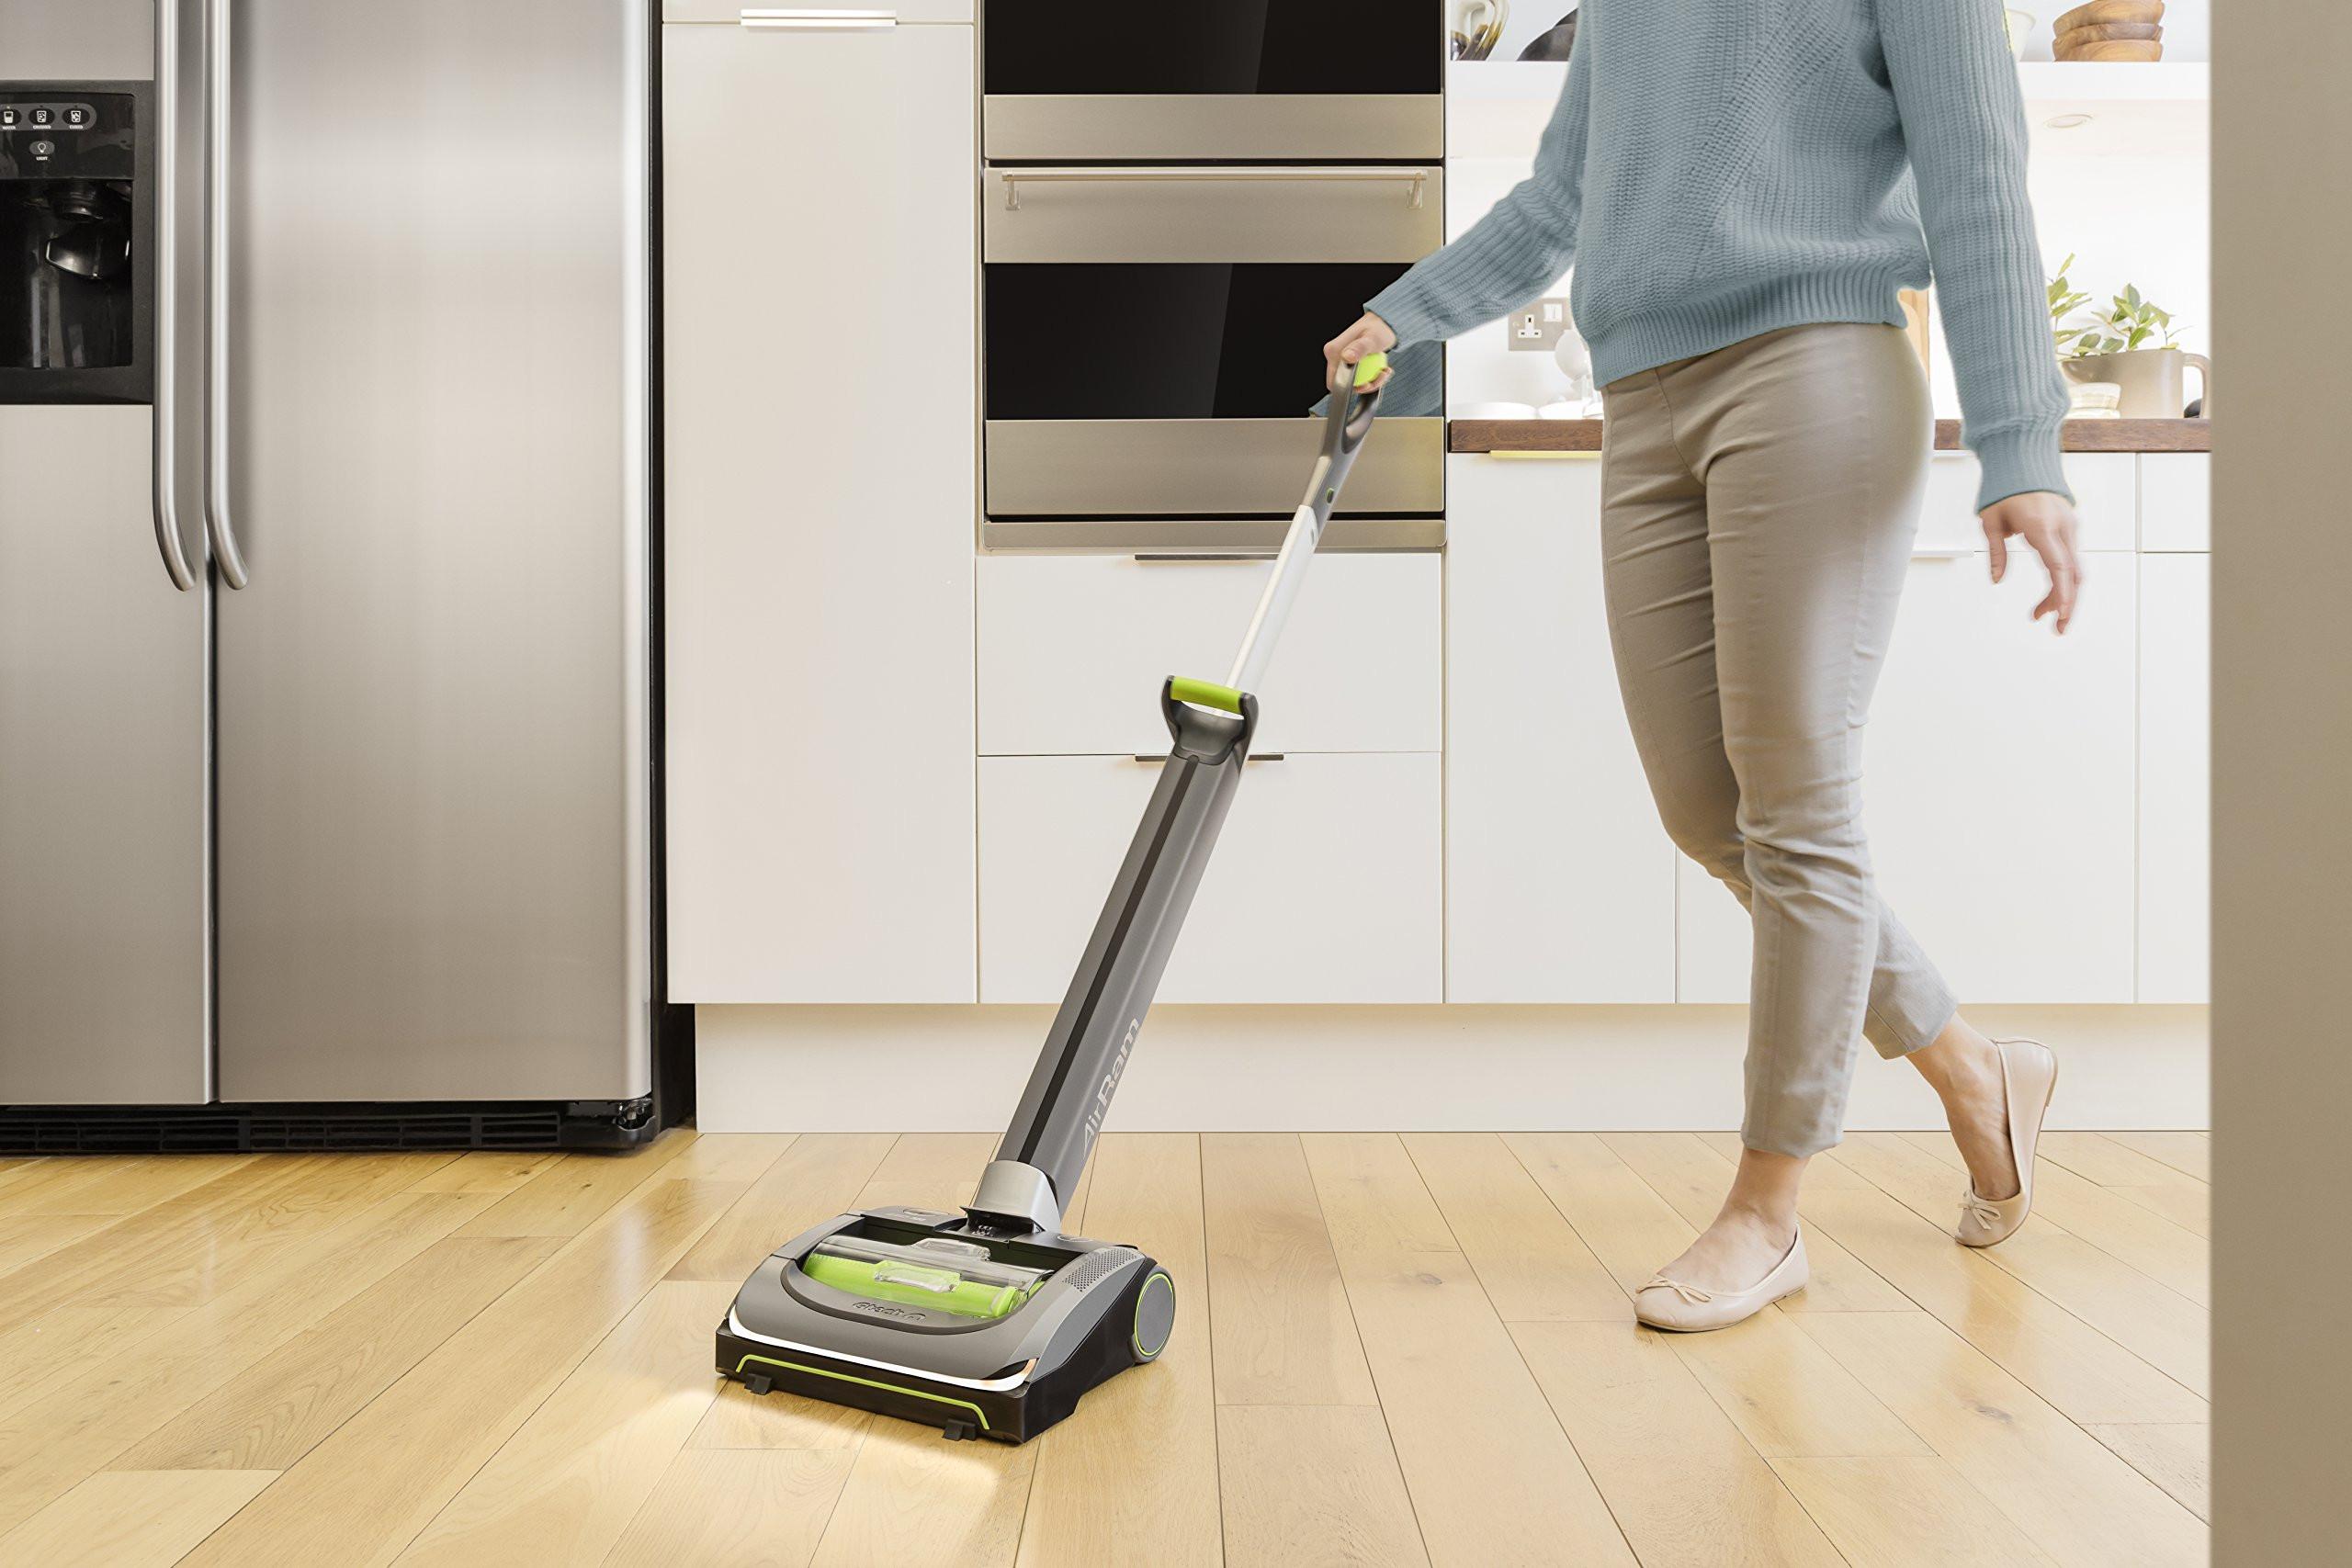 lightweight hardwood floor vacuum reviews of vacuum and floor care shop amazon uk with regard to vacuum cleaners